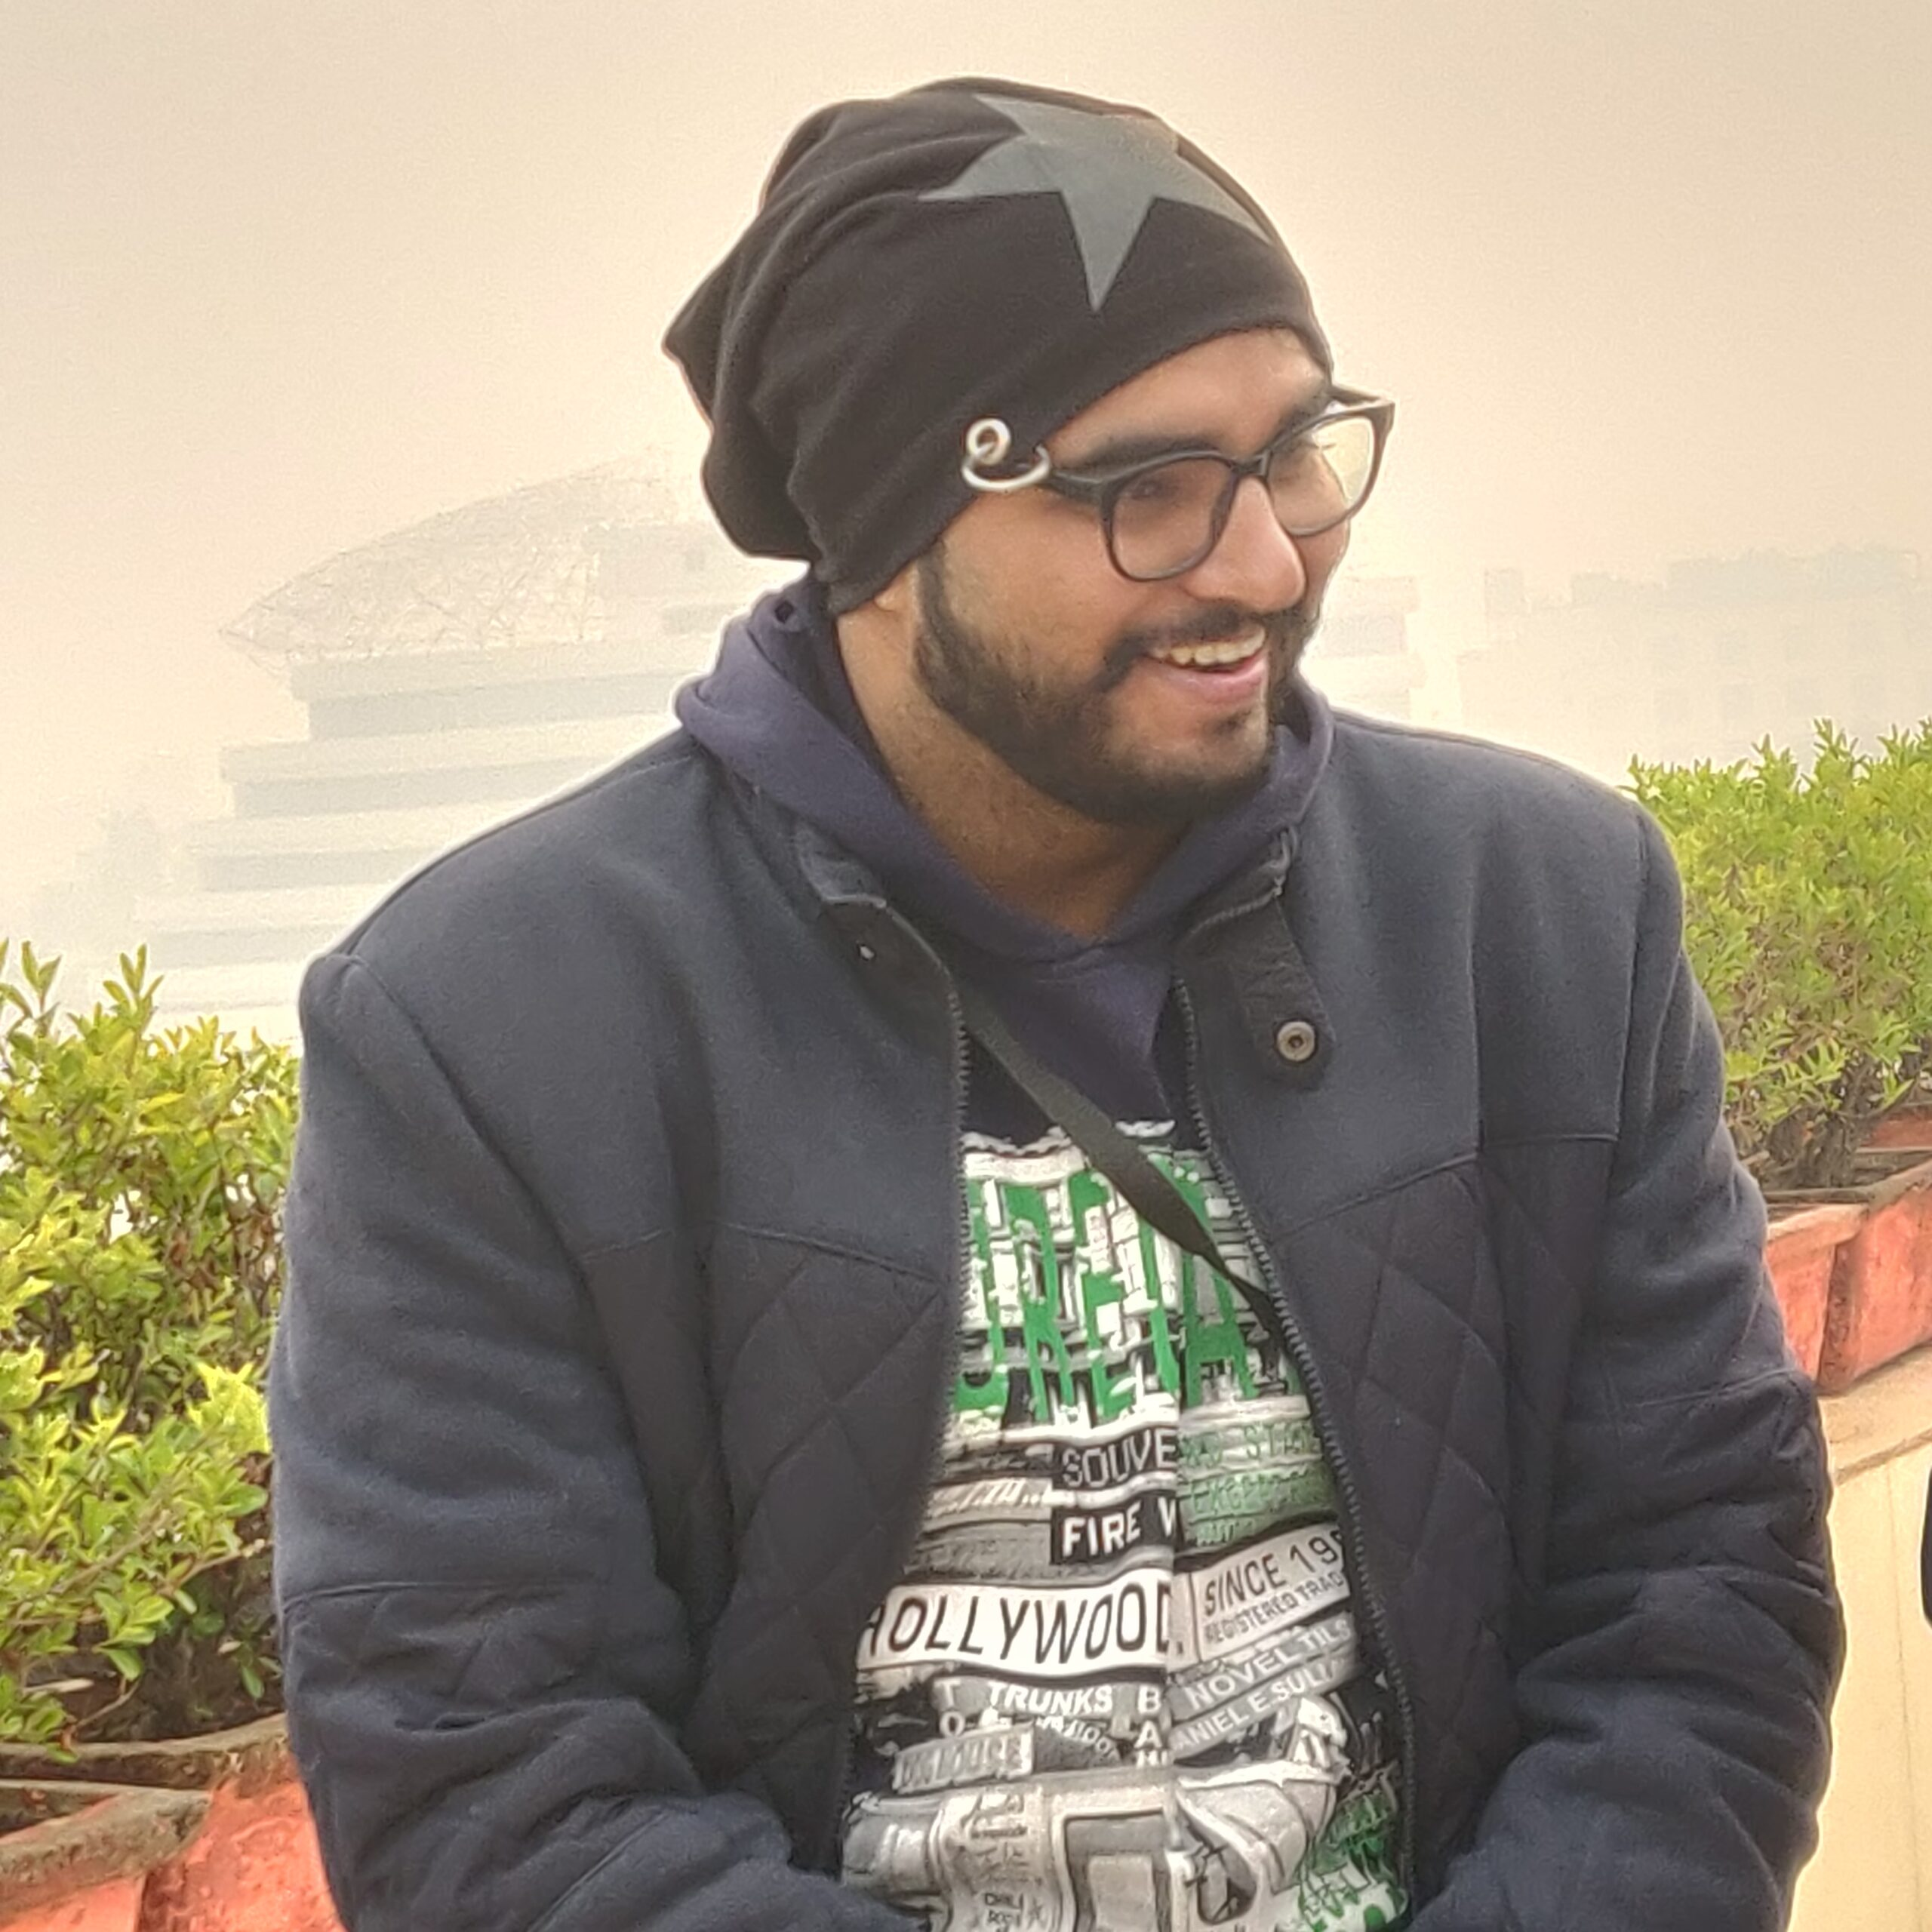 Avijeet Singh